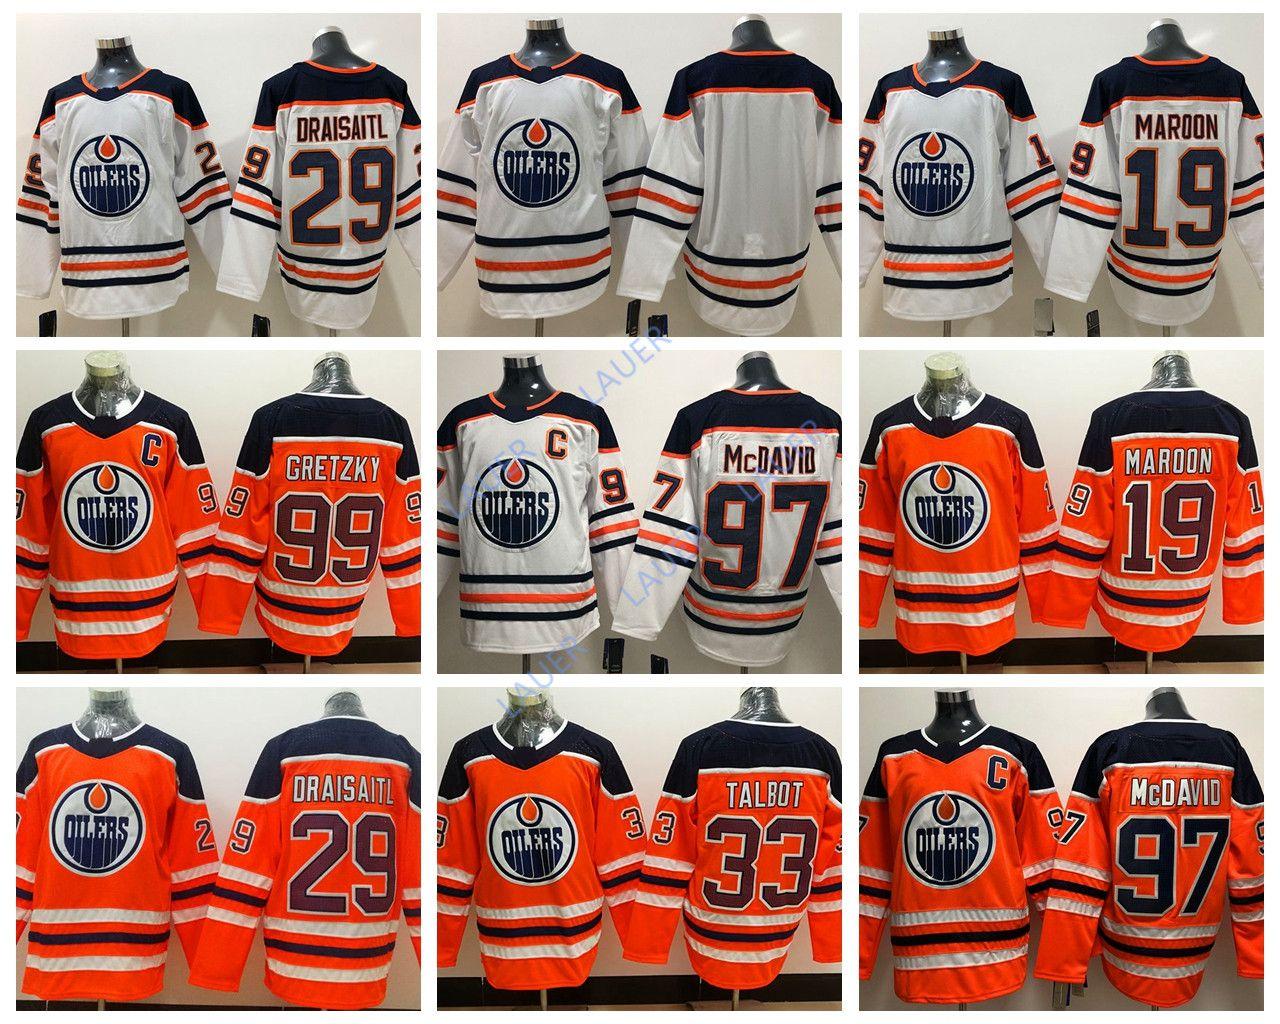 check out 430c9 ab8be Edmonton Jersey Oilers #97 Connor McDavid 29 Leon Draisaitl 19 Patrick  Maroon 33 Cam Talbot 99 Wayne Gretzky Stitched Ice Hockey Men